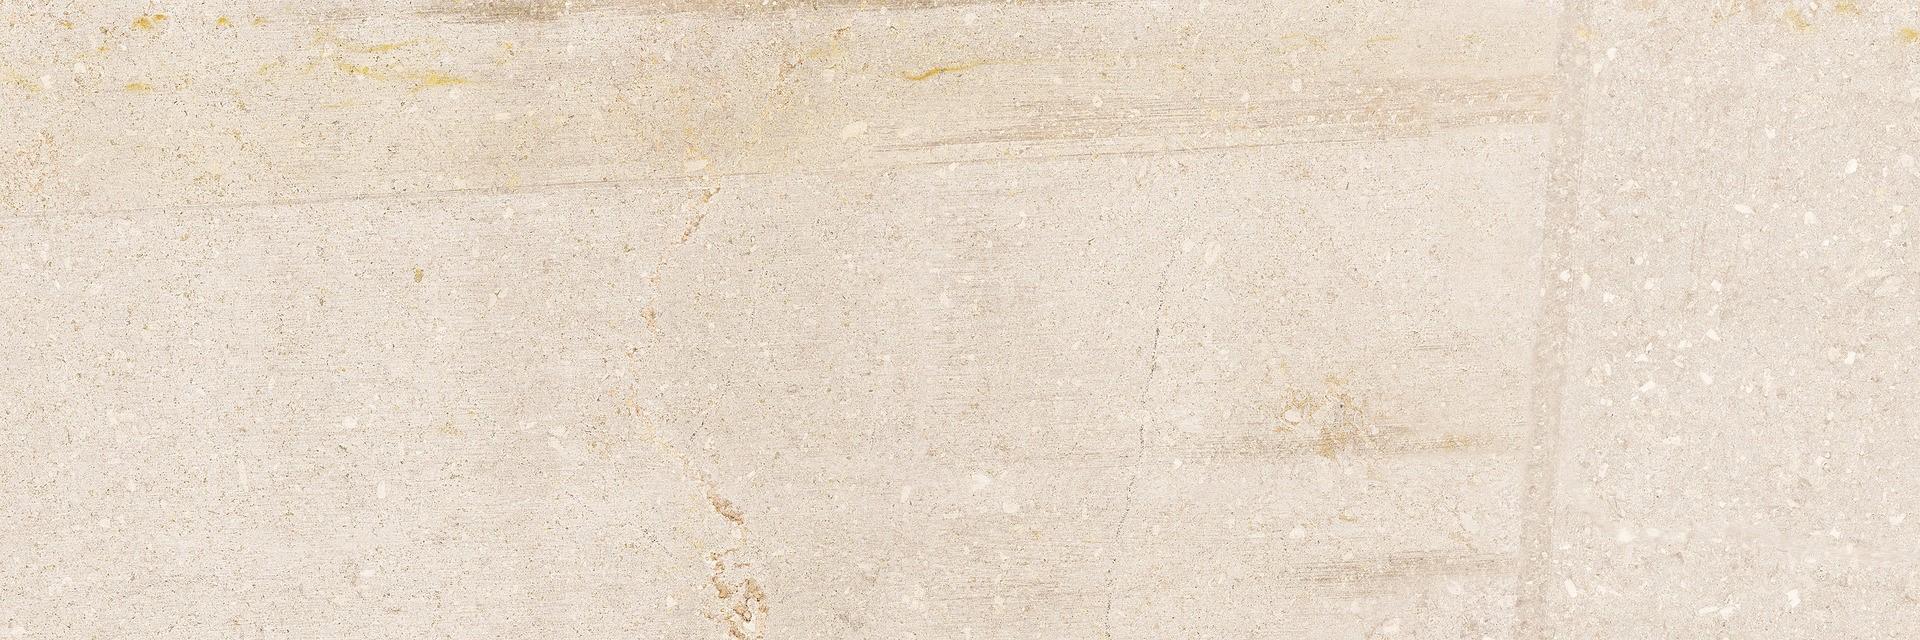 Obklad Sand 30x90 cm, mat